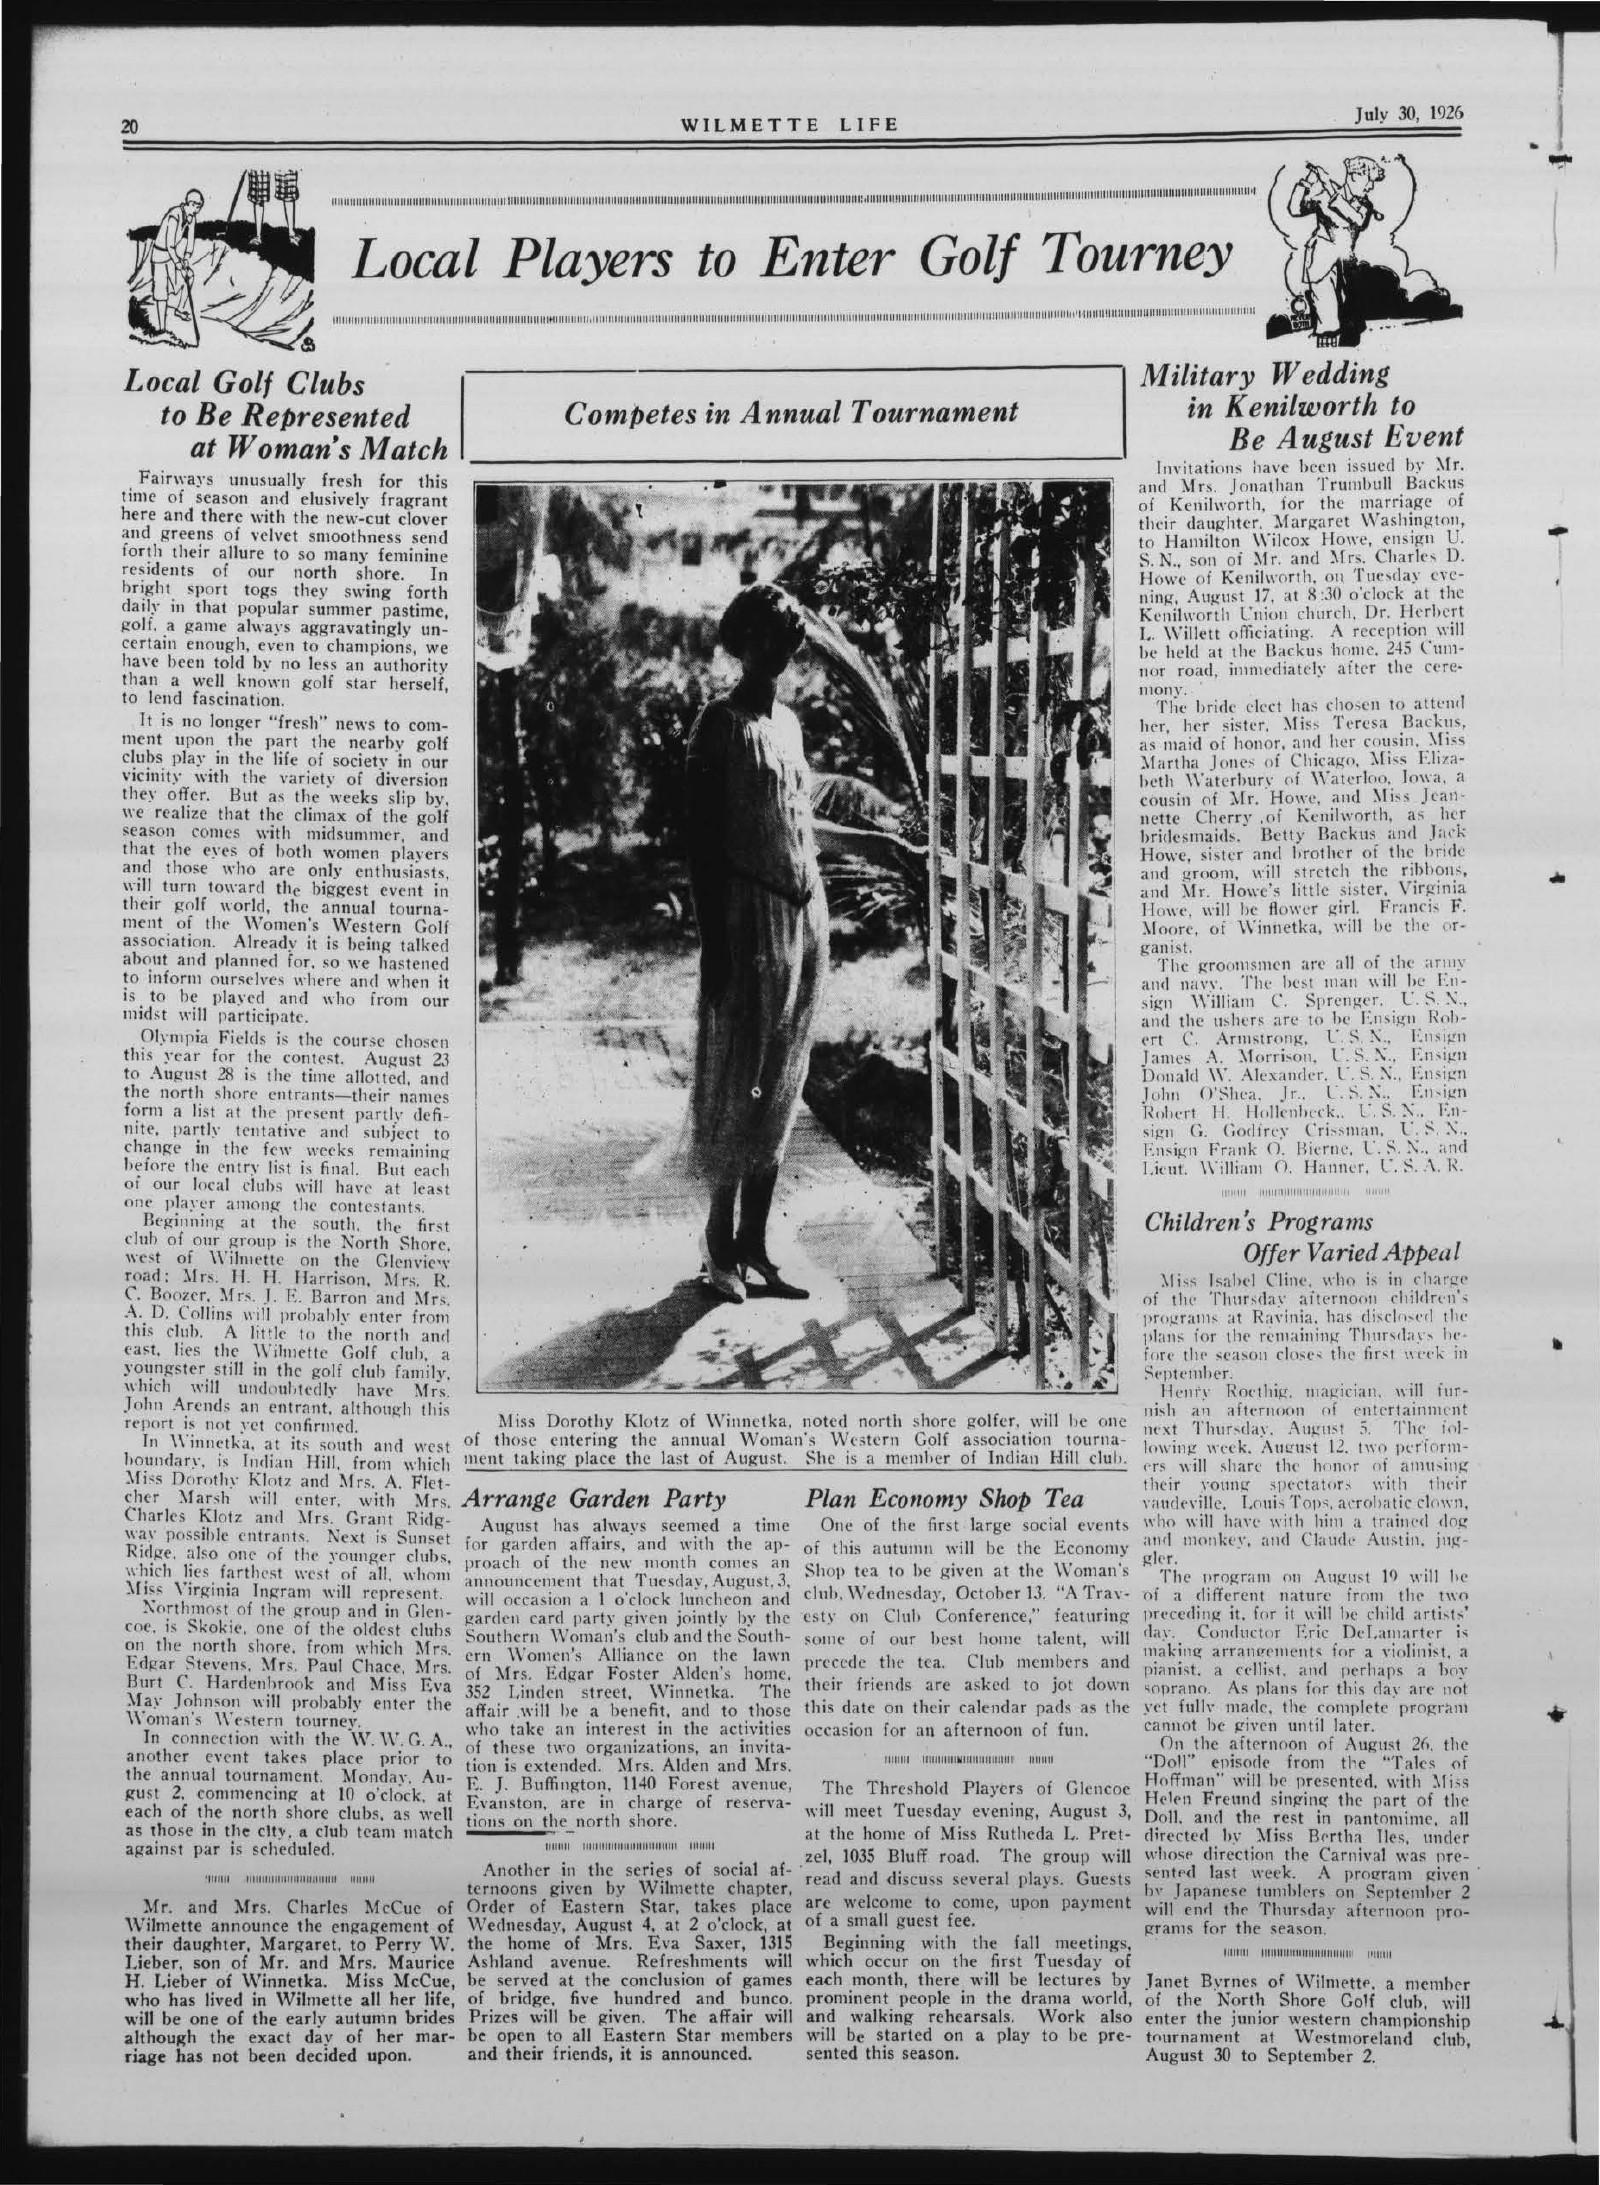 Wilmette Life (Wilmette, Illinois), 30 Jul 1926